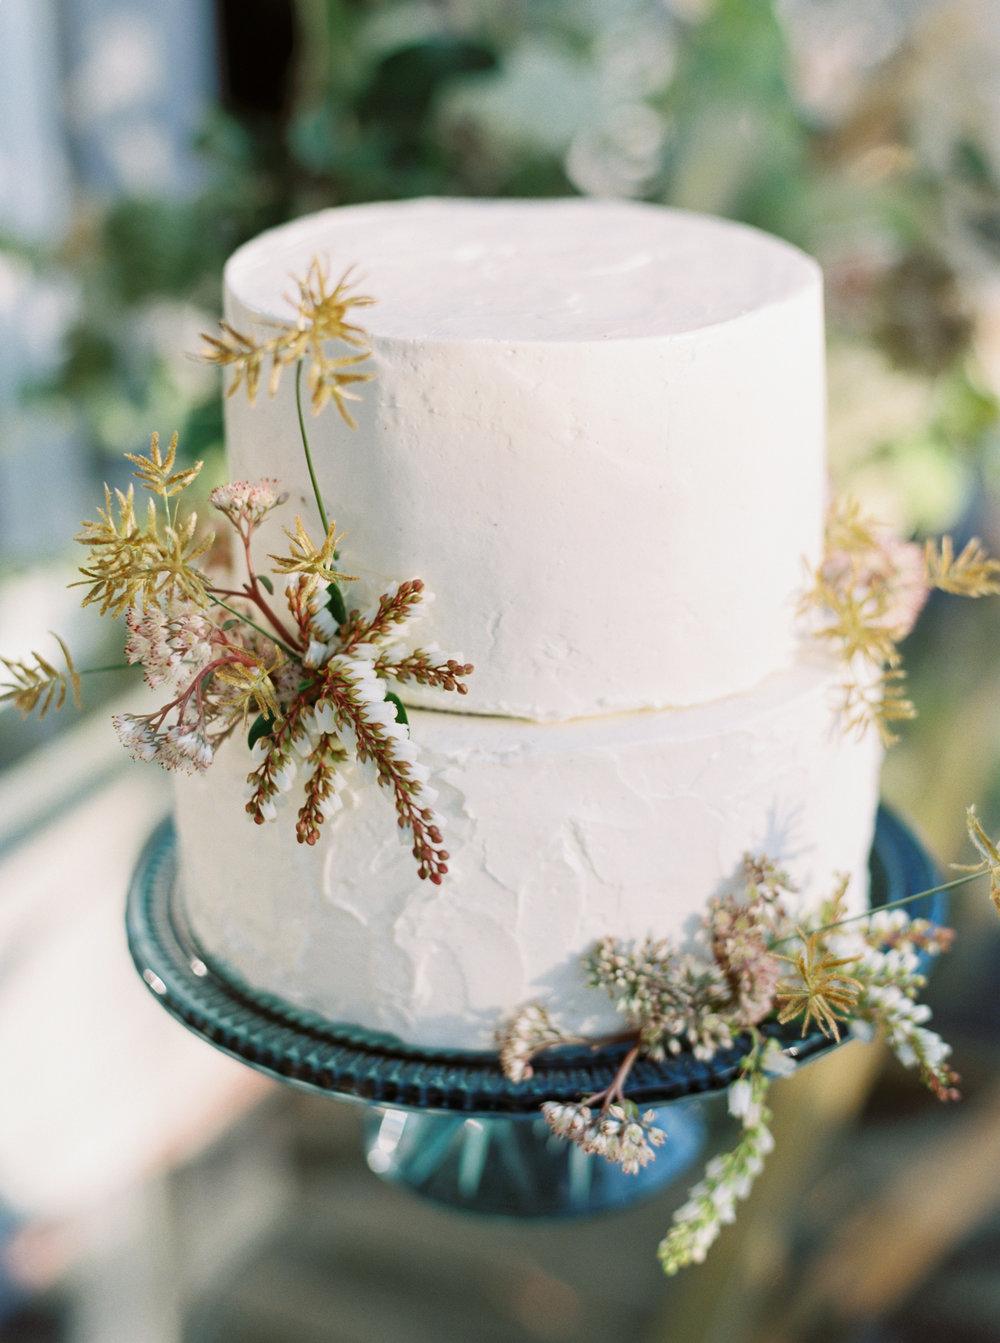 12th-Table-BIG-SUR-WEDDING-Erich-McVey-19